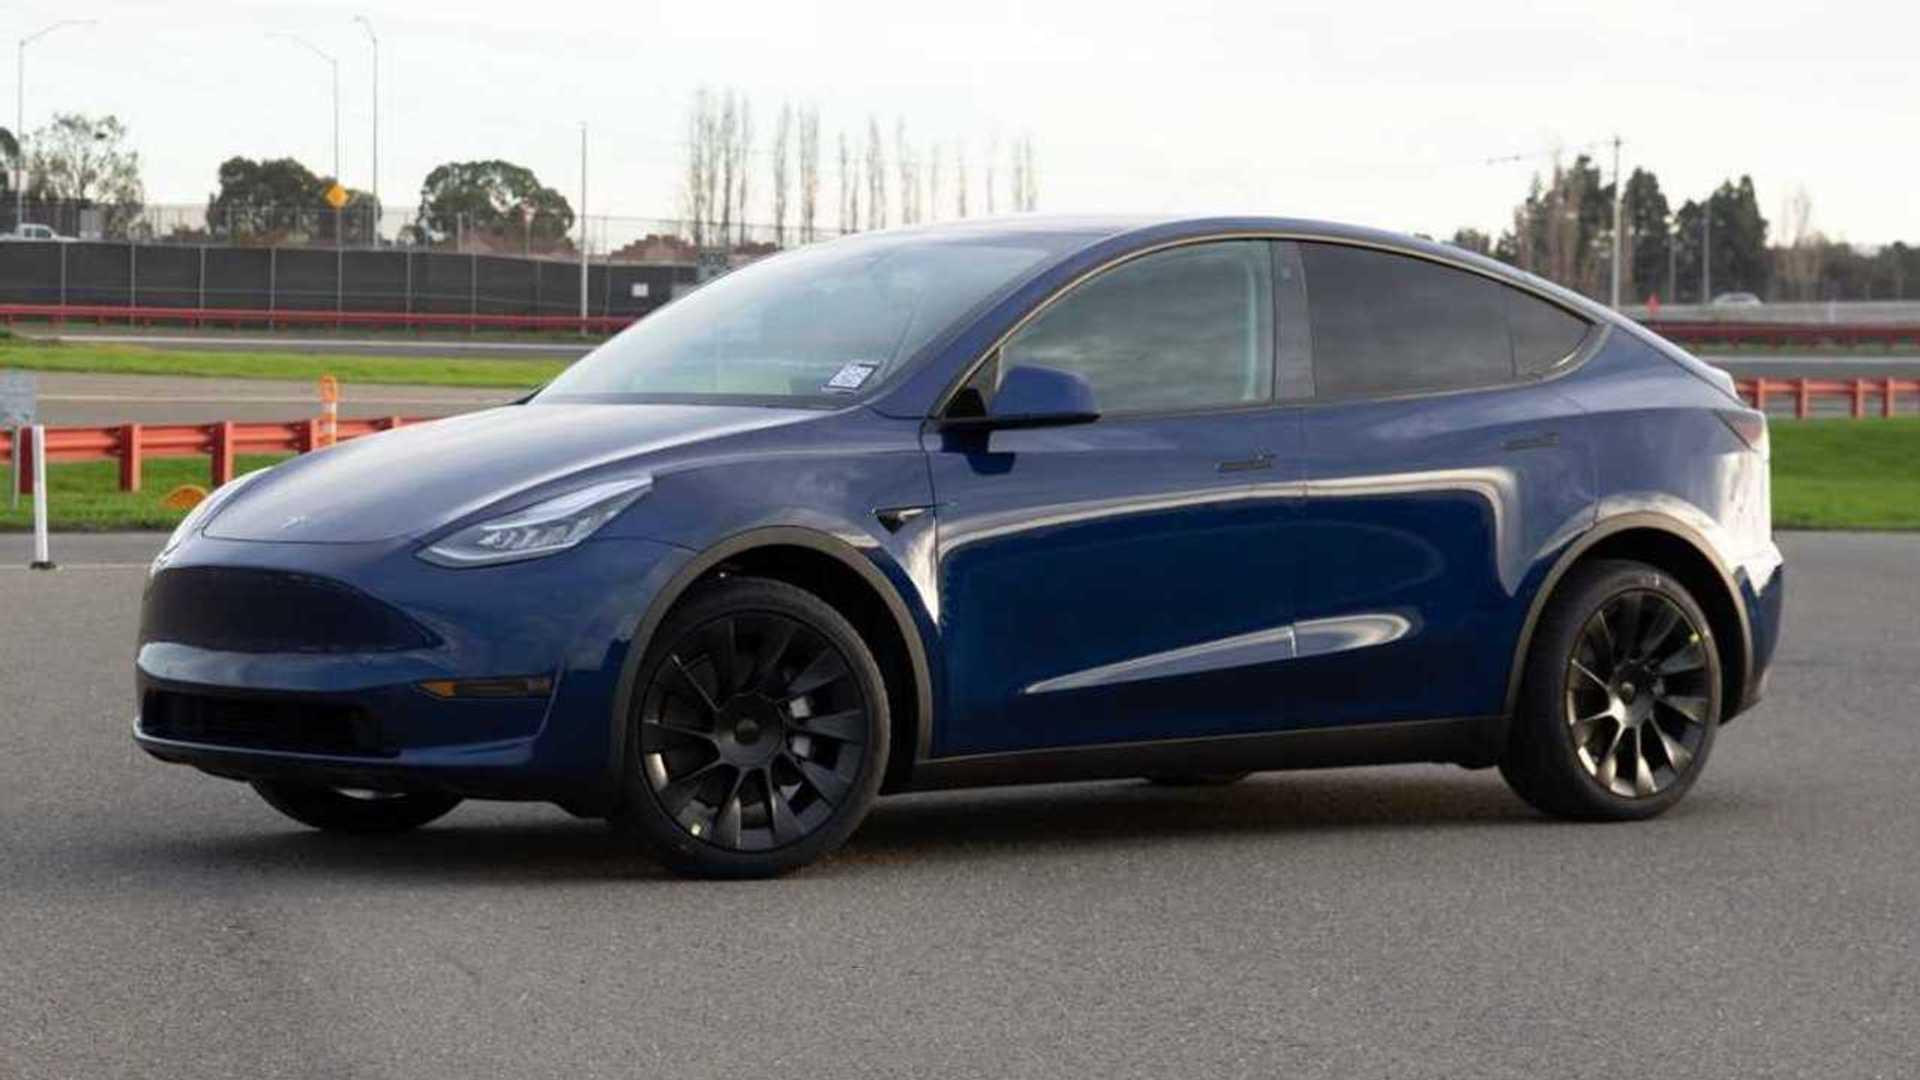 Tesla Model Y - January 2020 Production vehicle